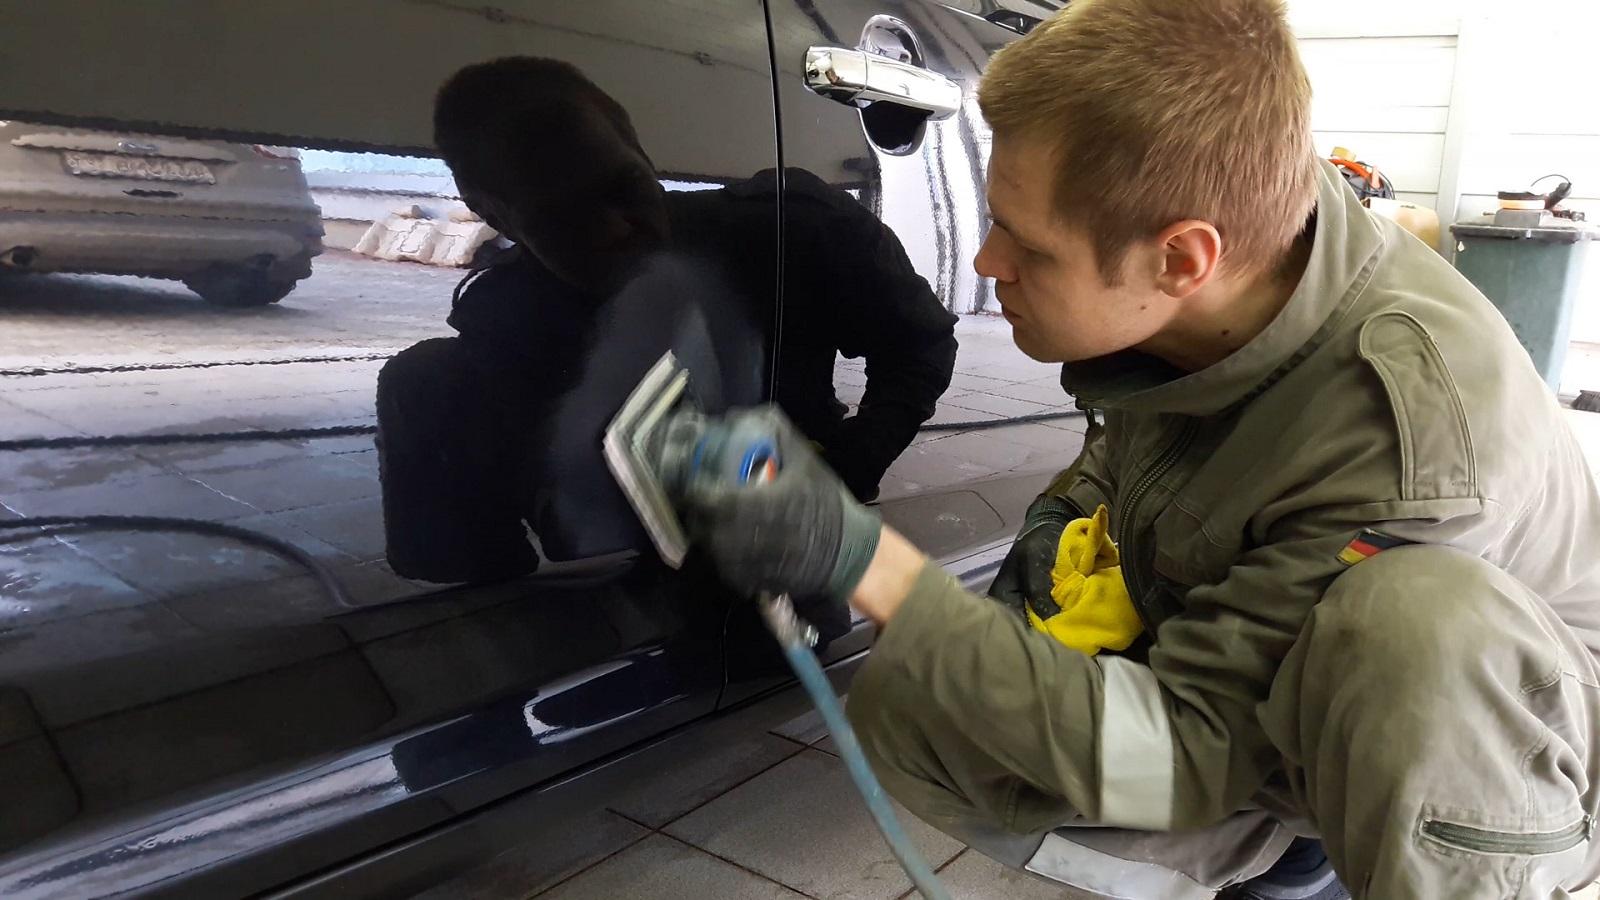 Зачистка кузова автомобиля перед холодной оцинковкой